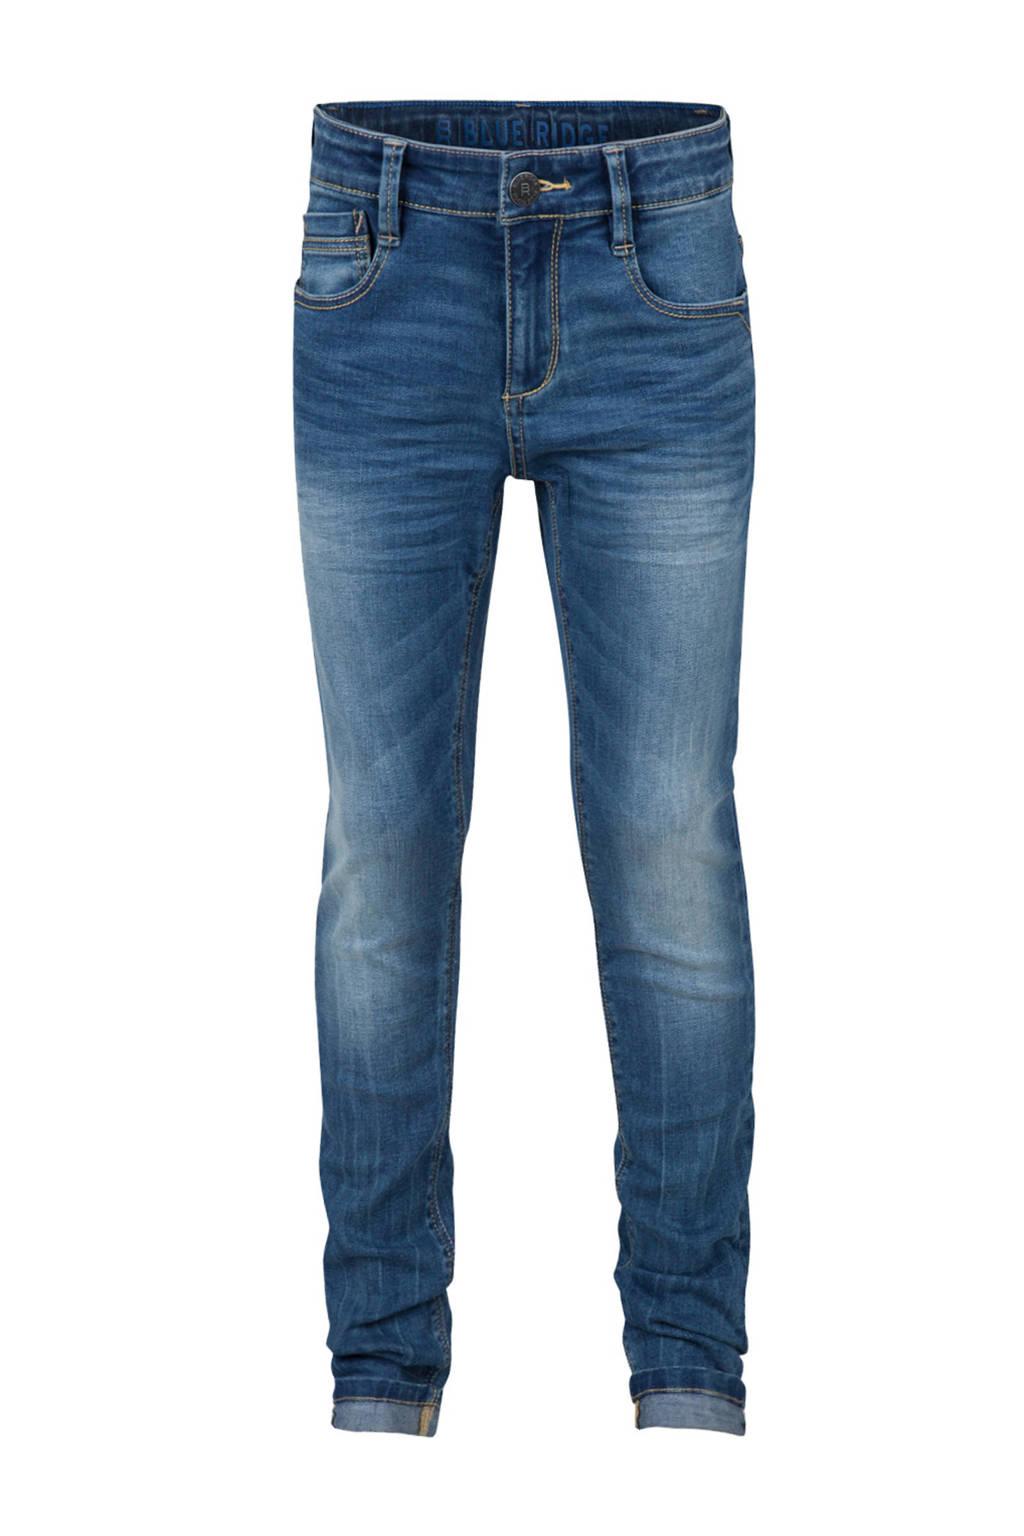 WE Fashion Blue Ridge skinny fit jeans Alfer Salt, Dark denim